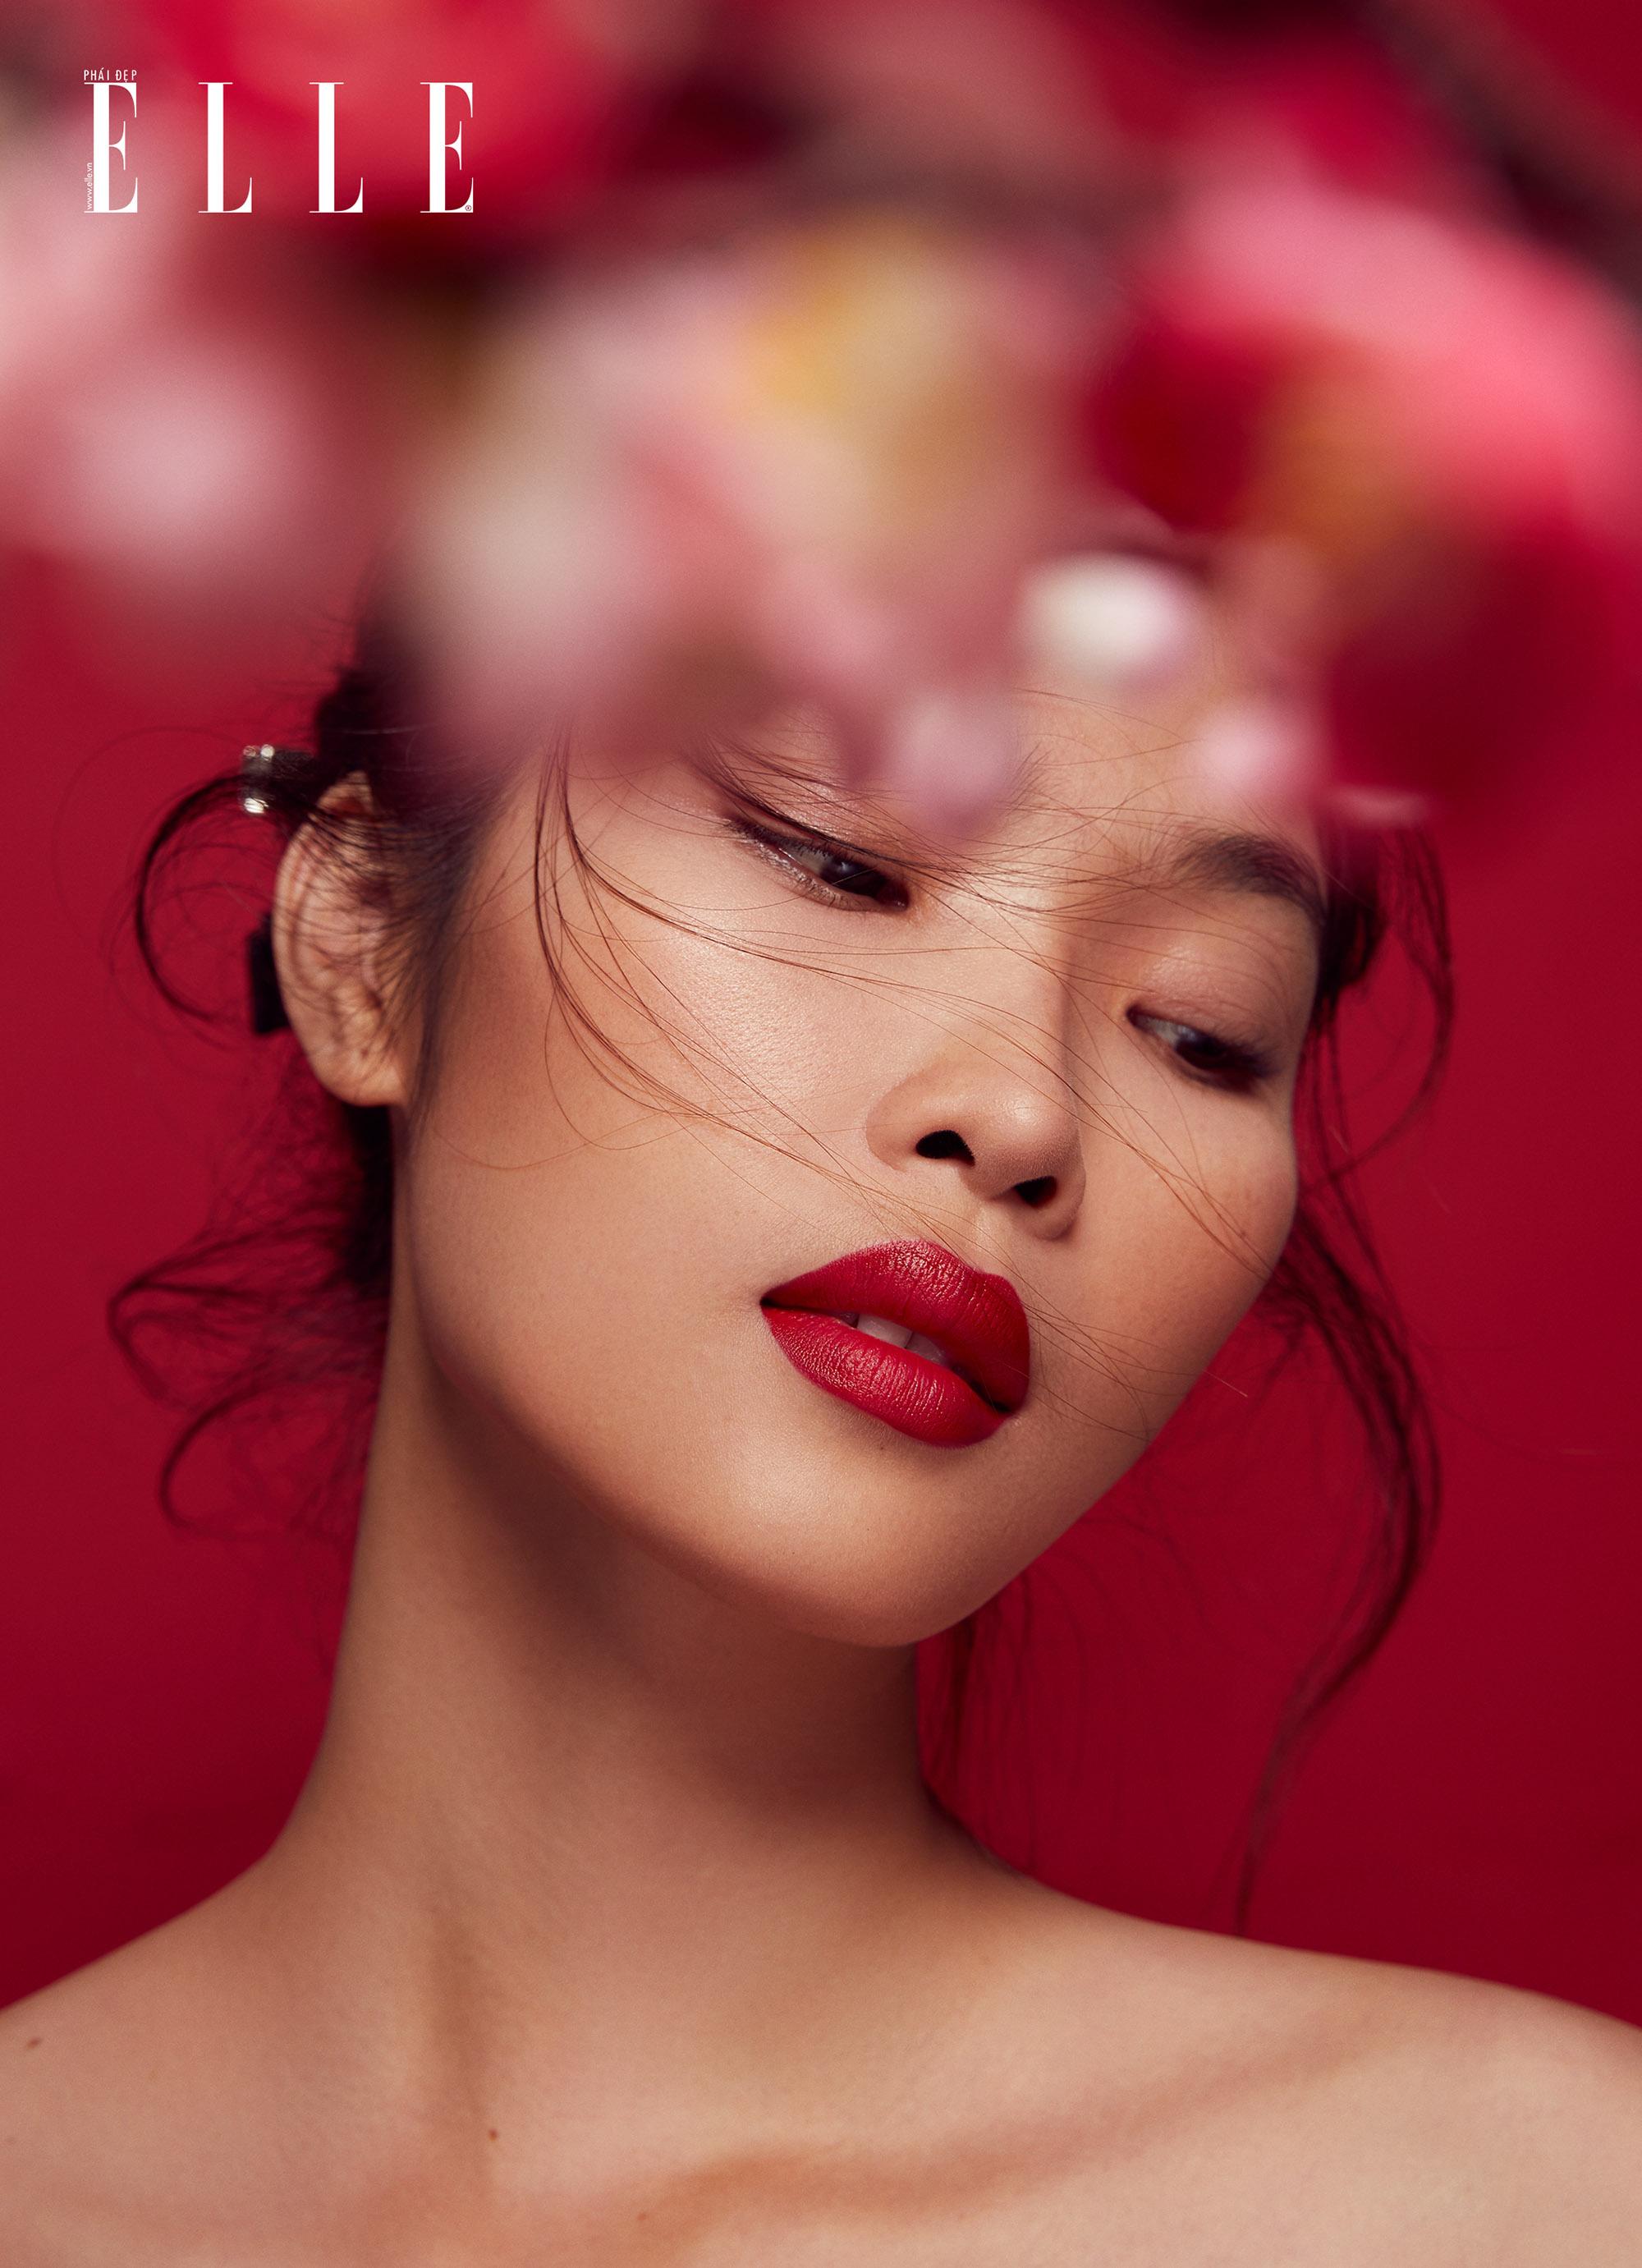 Cle de Peau beaute sắc môi đỏ truyền thống